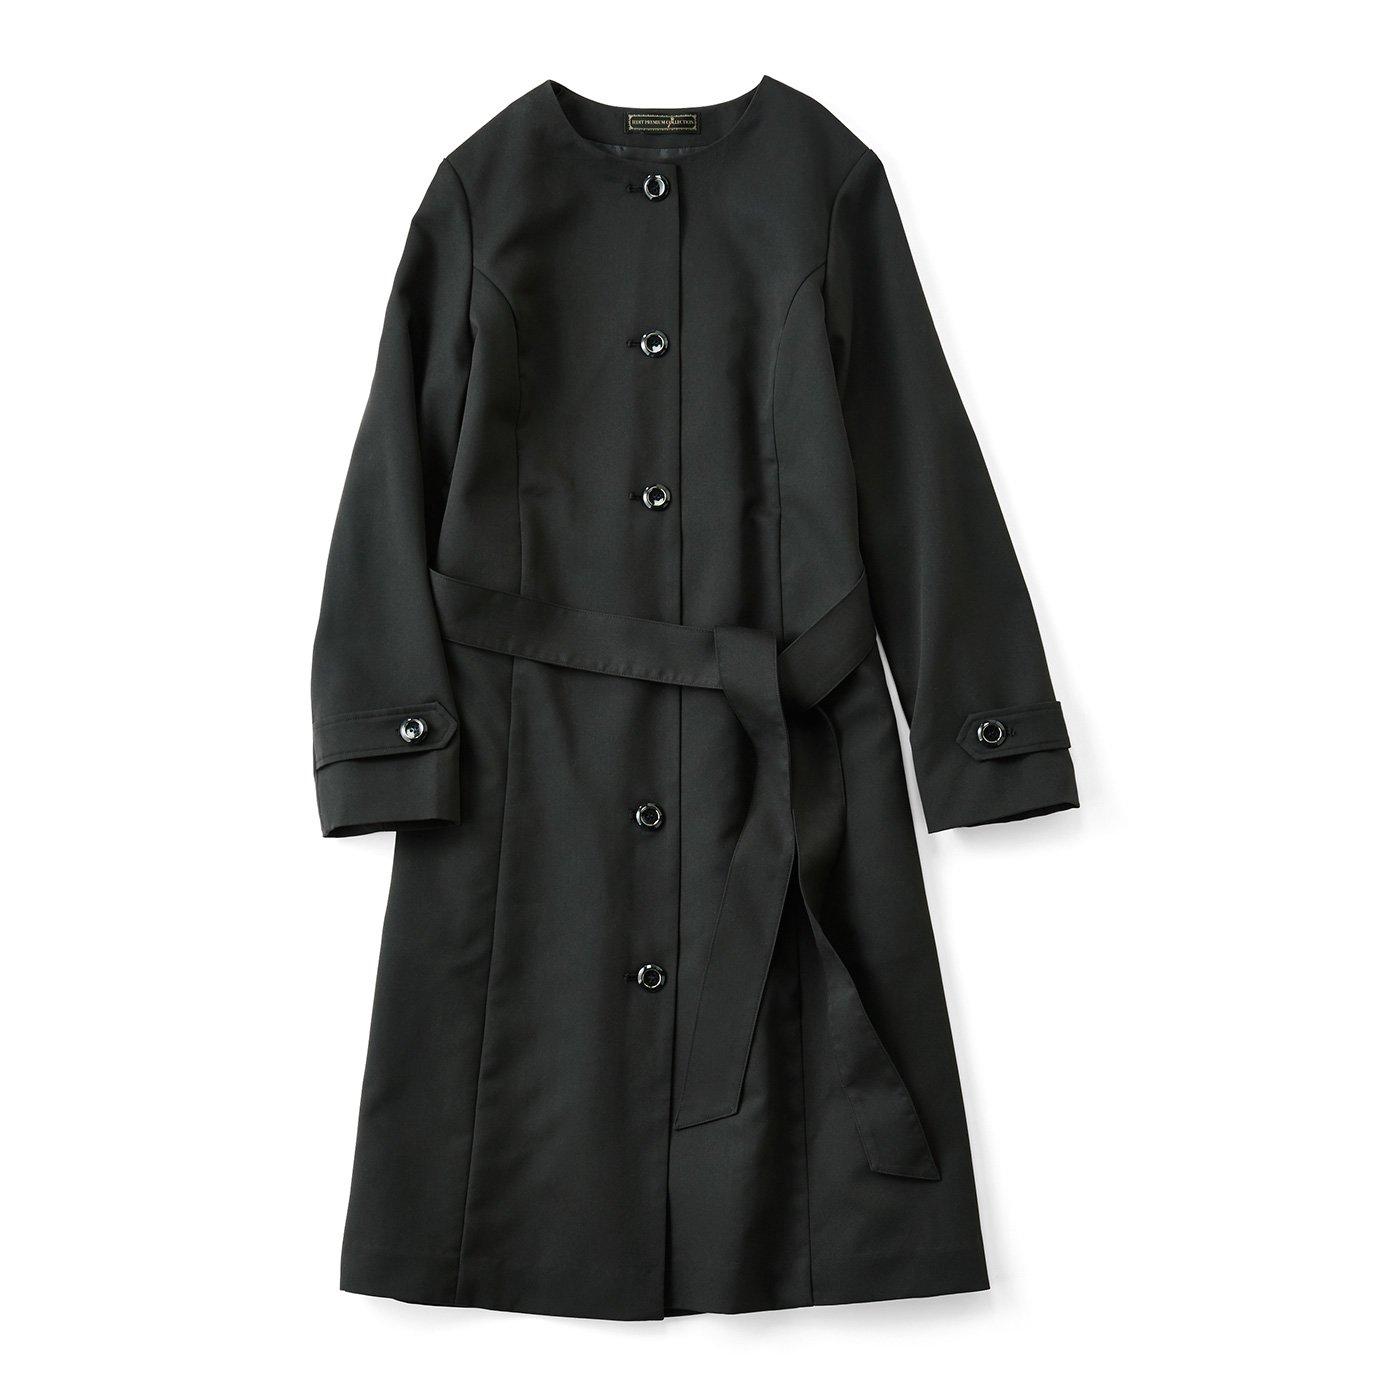 IEDIT[イディット] シーンを格上げする 撥水加工のドレスコート〈ブラック〉